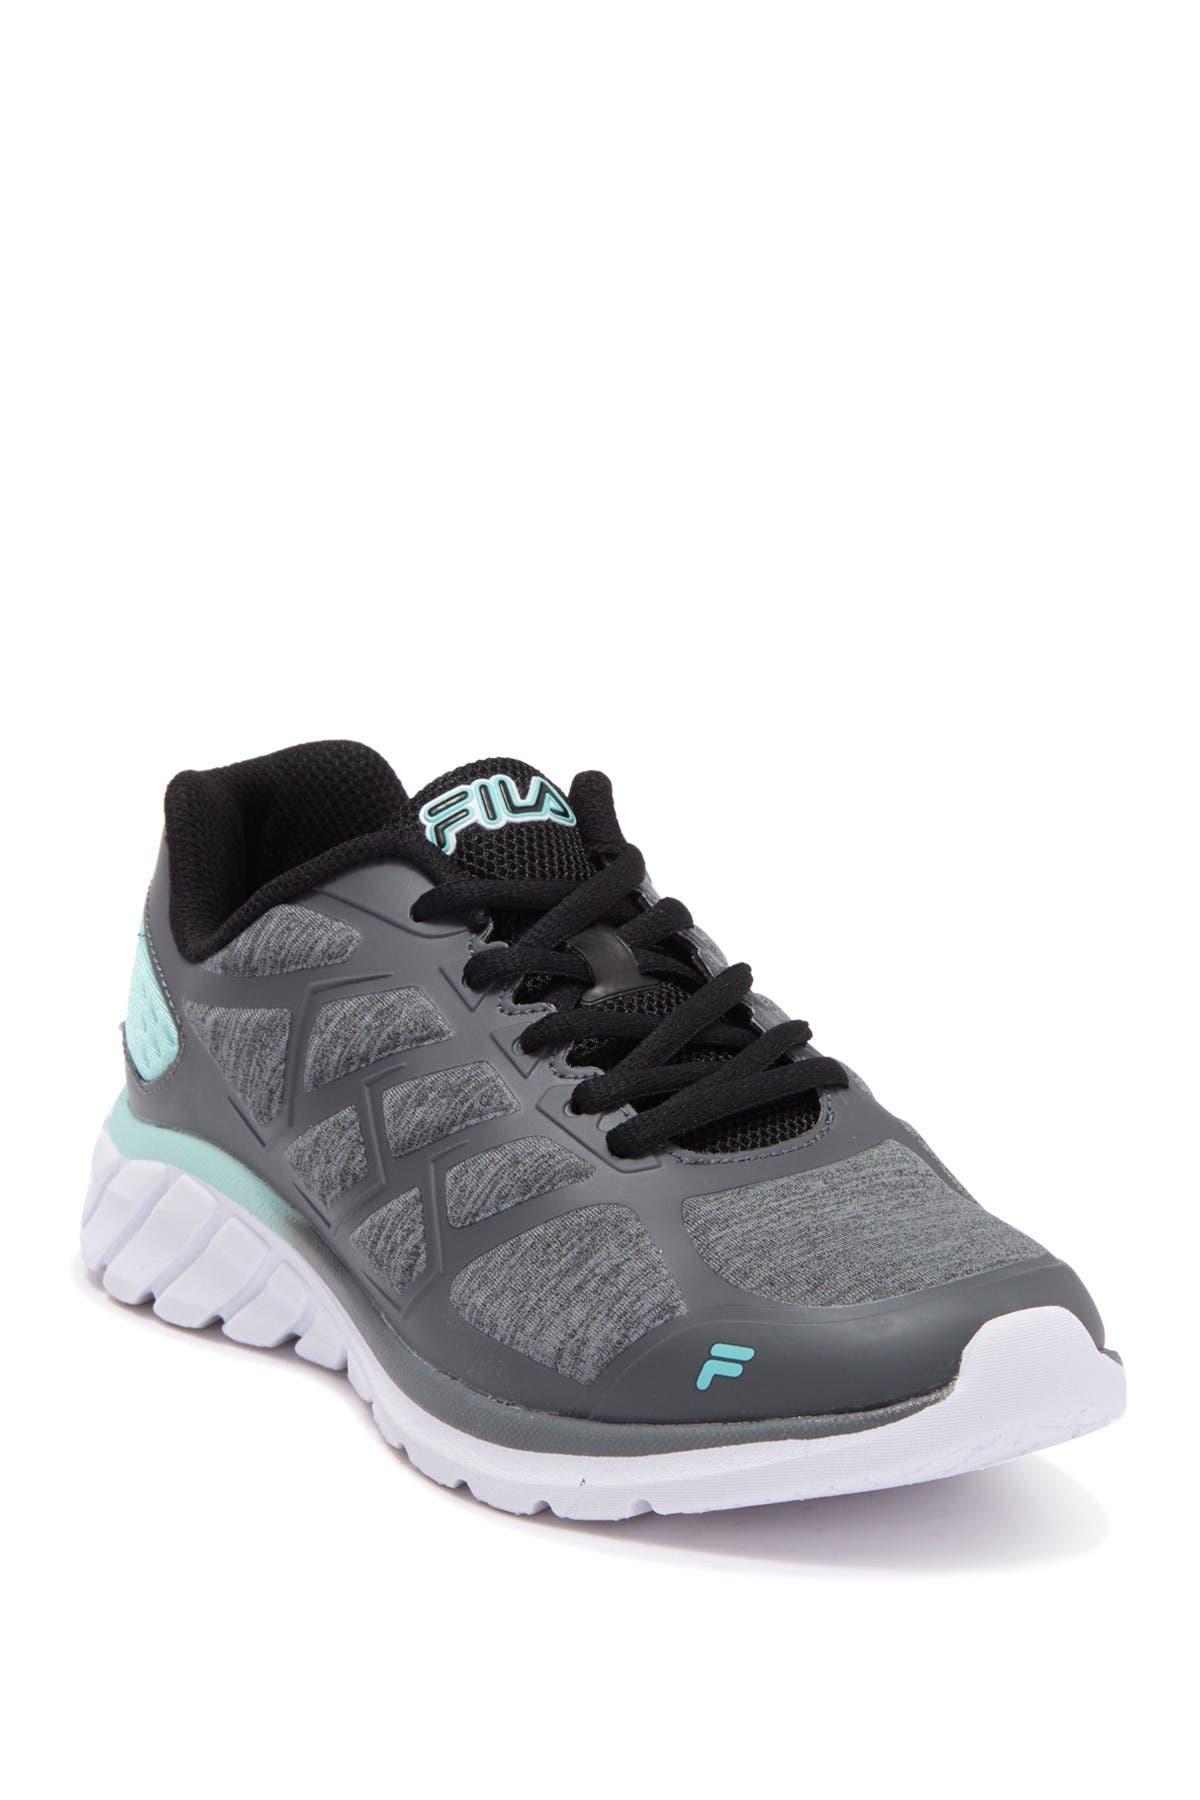 Image of FILA USA Memory Superstride Sneaker